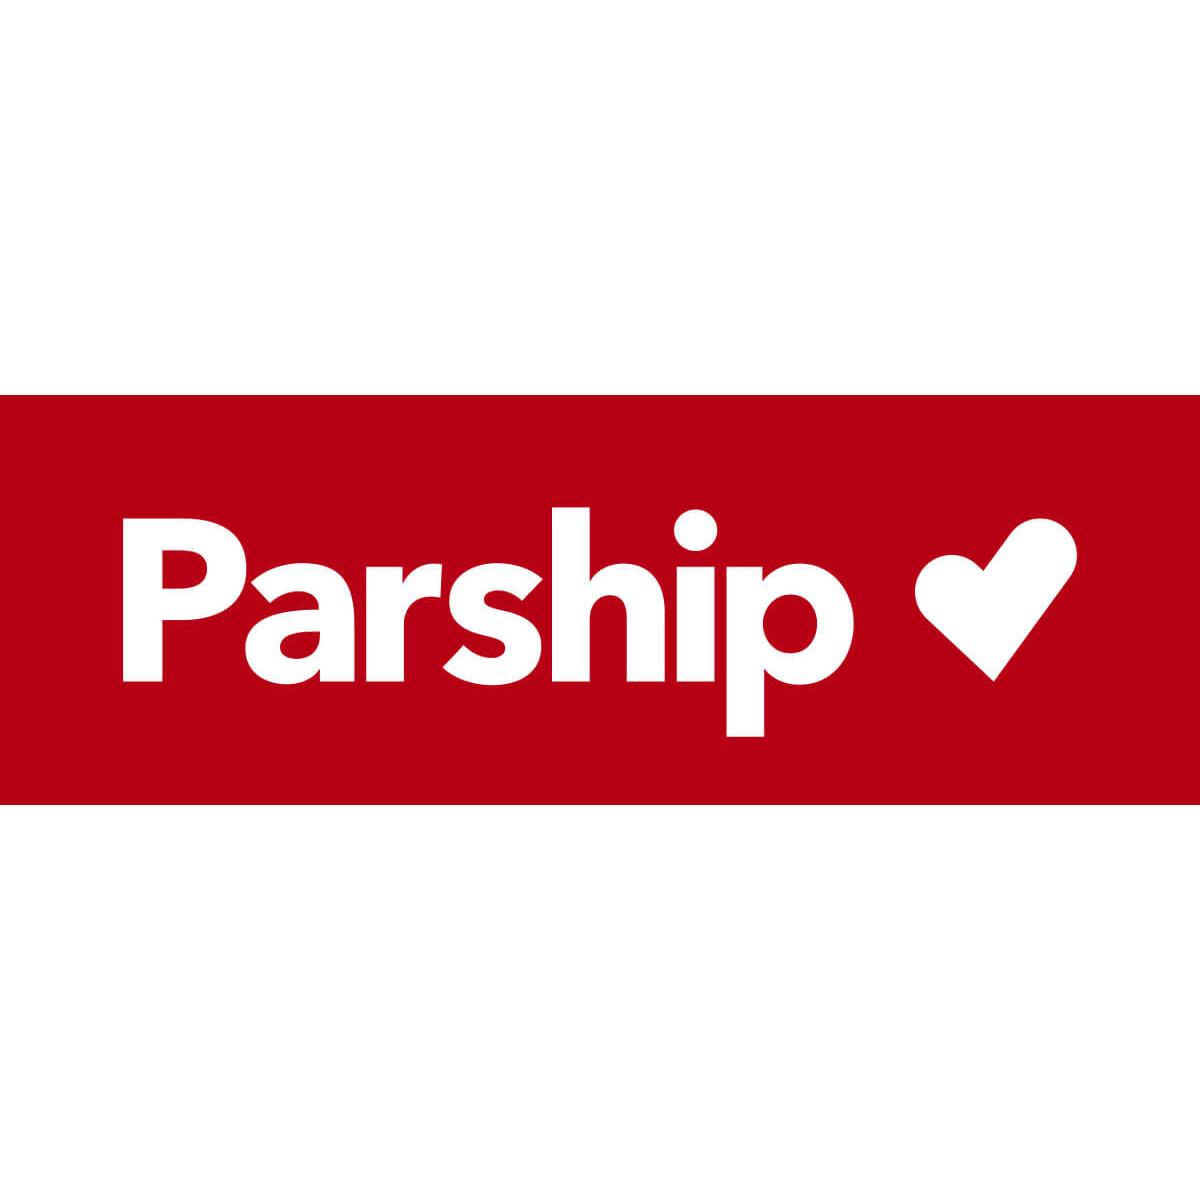 Parship rabatt 70